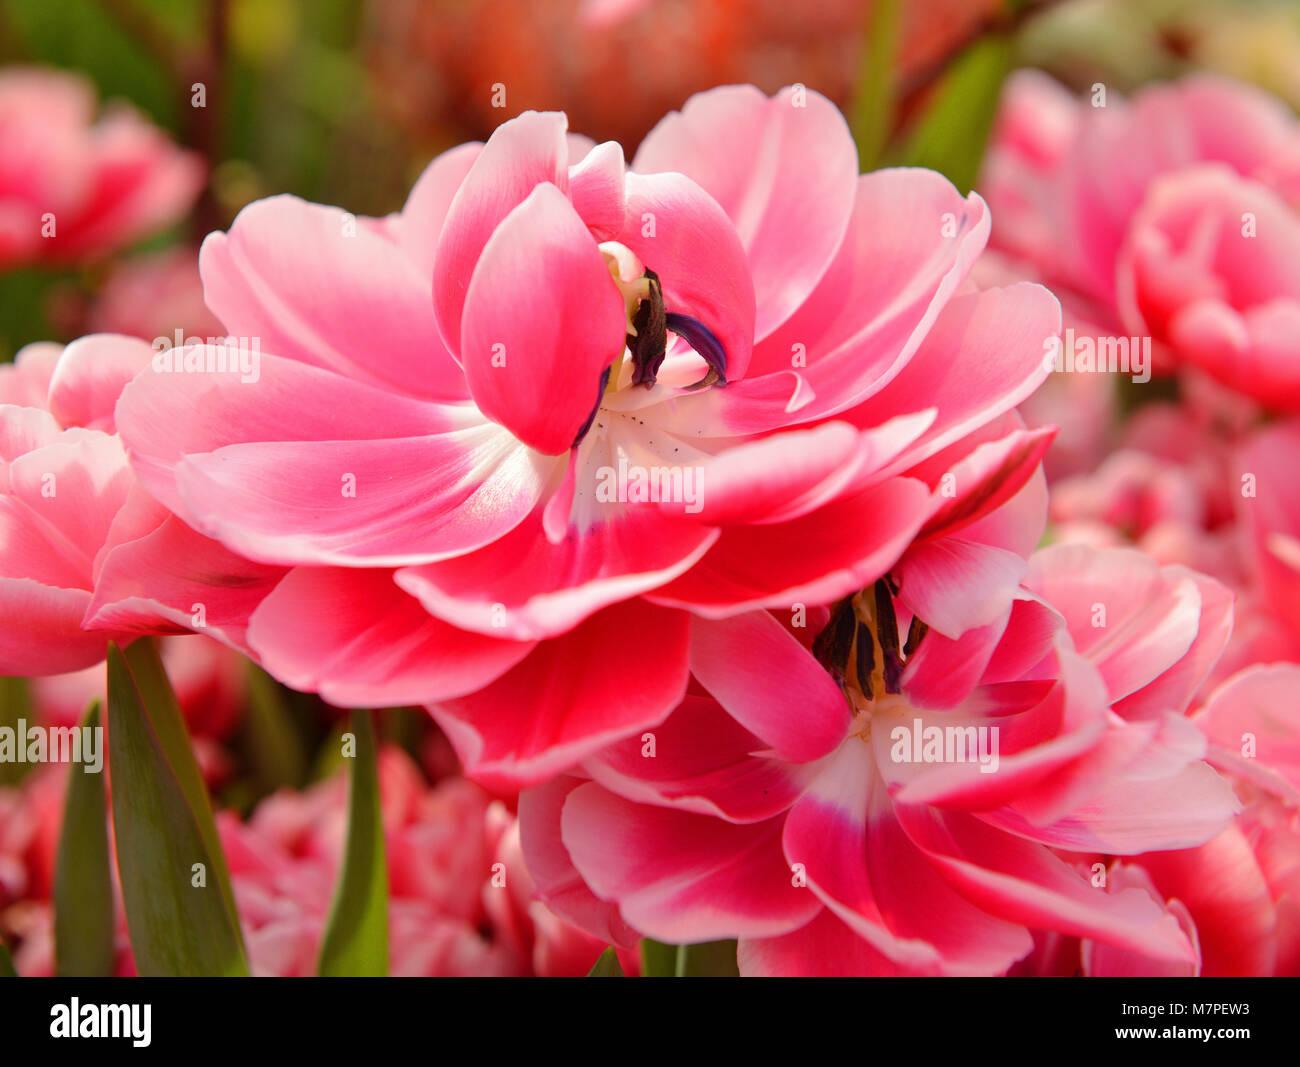 Tulip Columbus, reddish-pink edged white - Stock Image